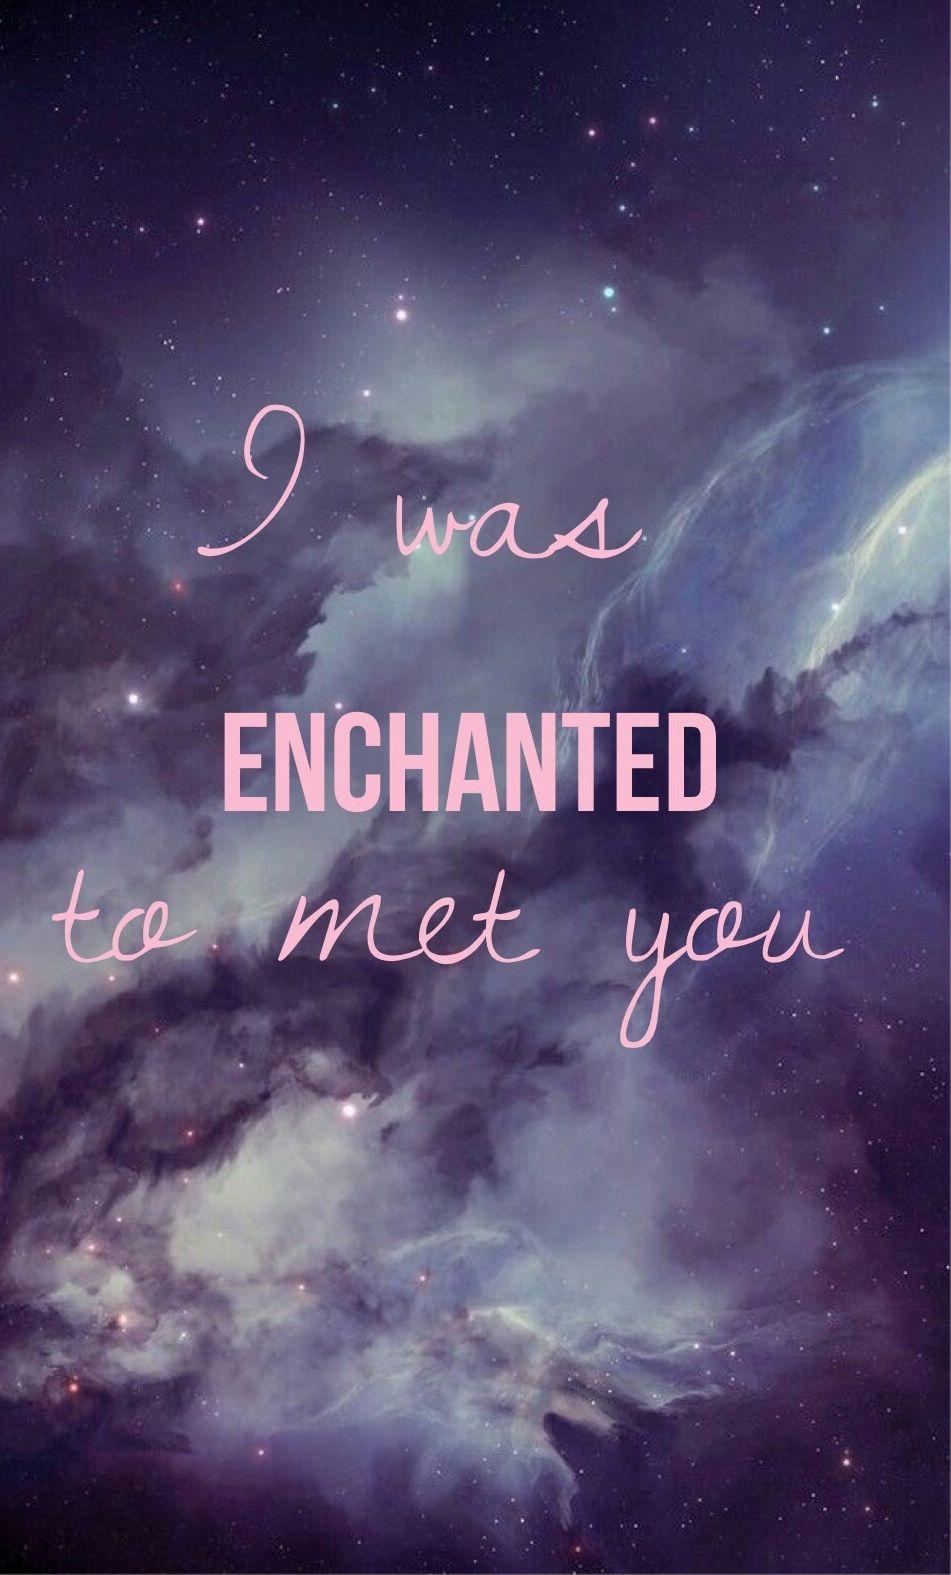 Enchanted Song Lyric Taylor Swift Song Lyrics Edit By Enchanted Swiftie Taylor Swift Song Lyrics Taylor Swift Lyrics Taylor Swift Quotes